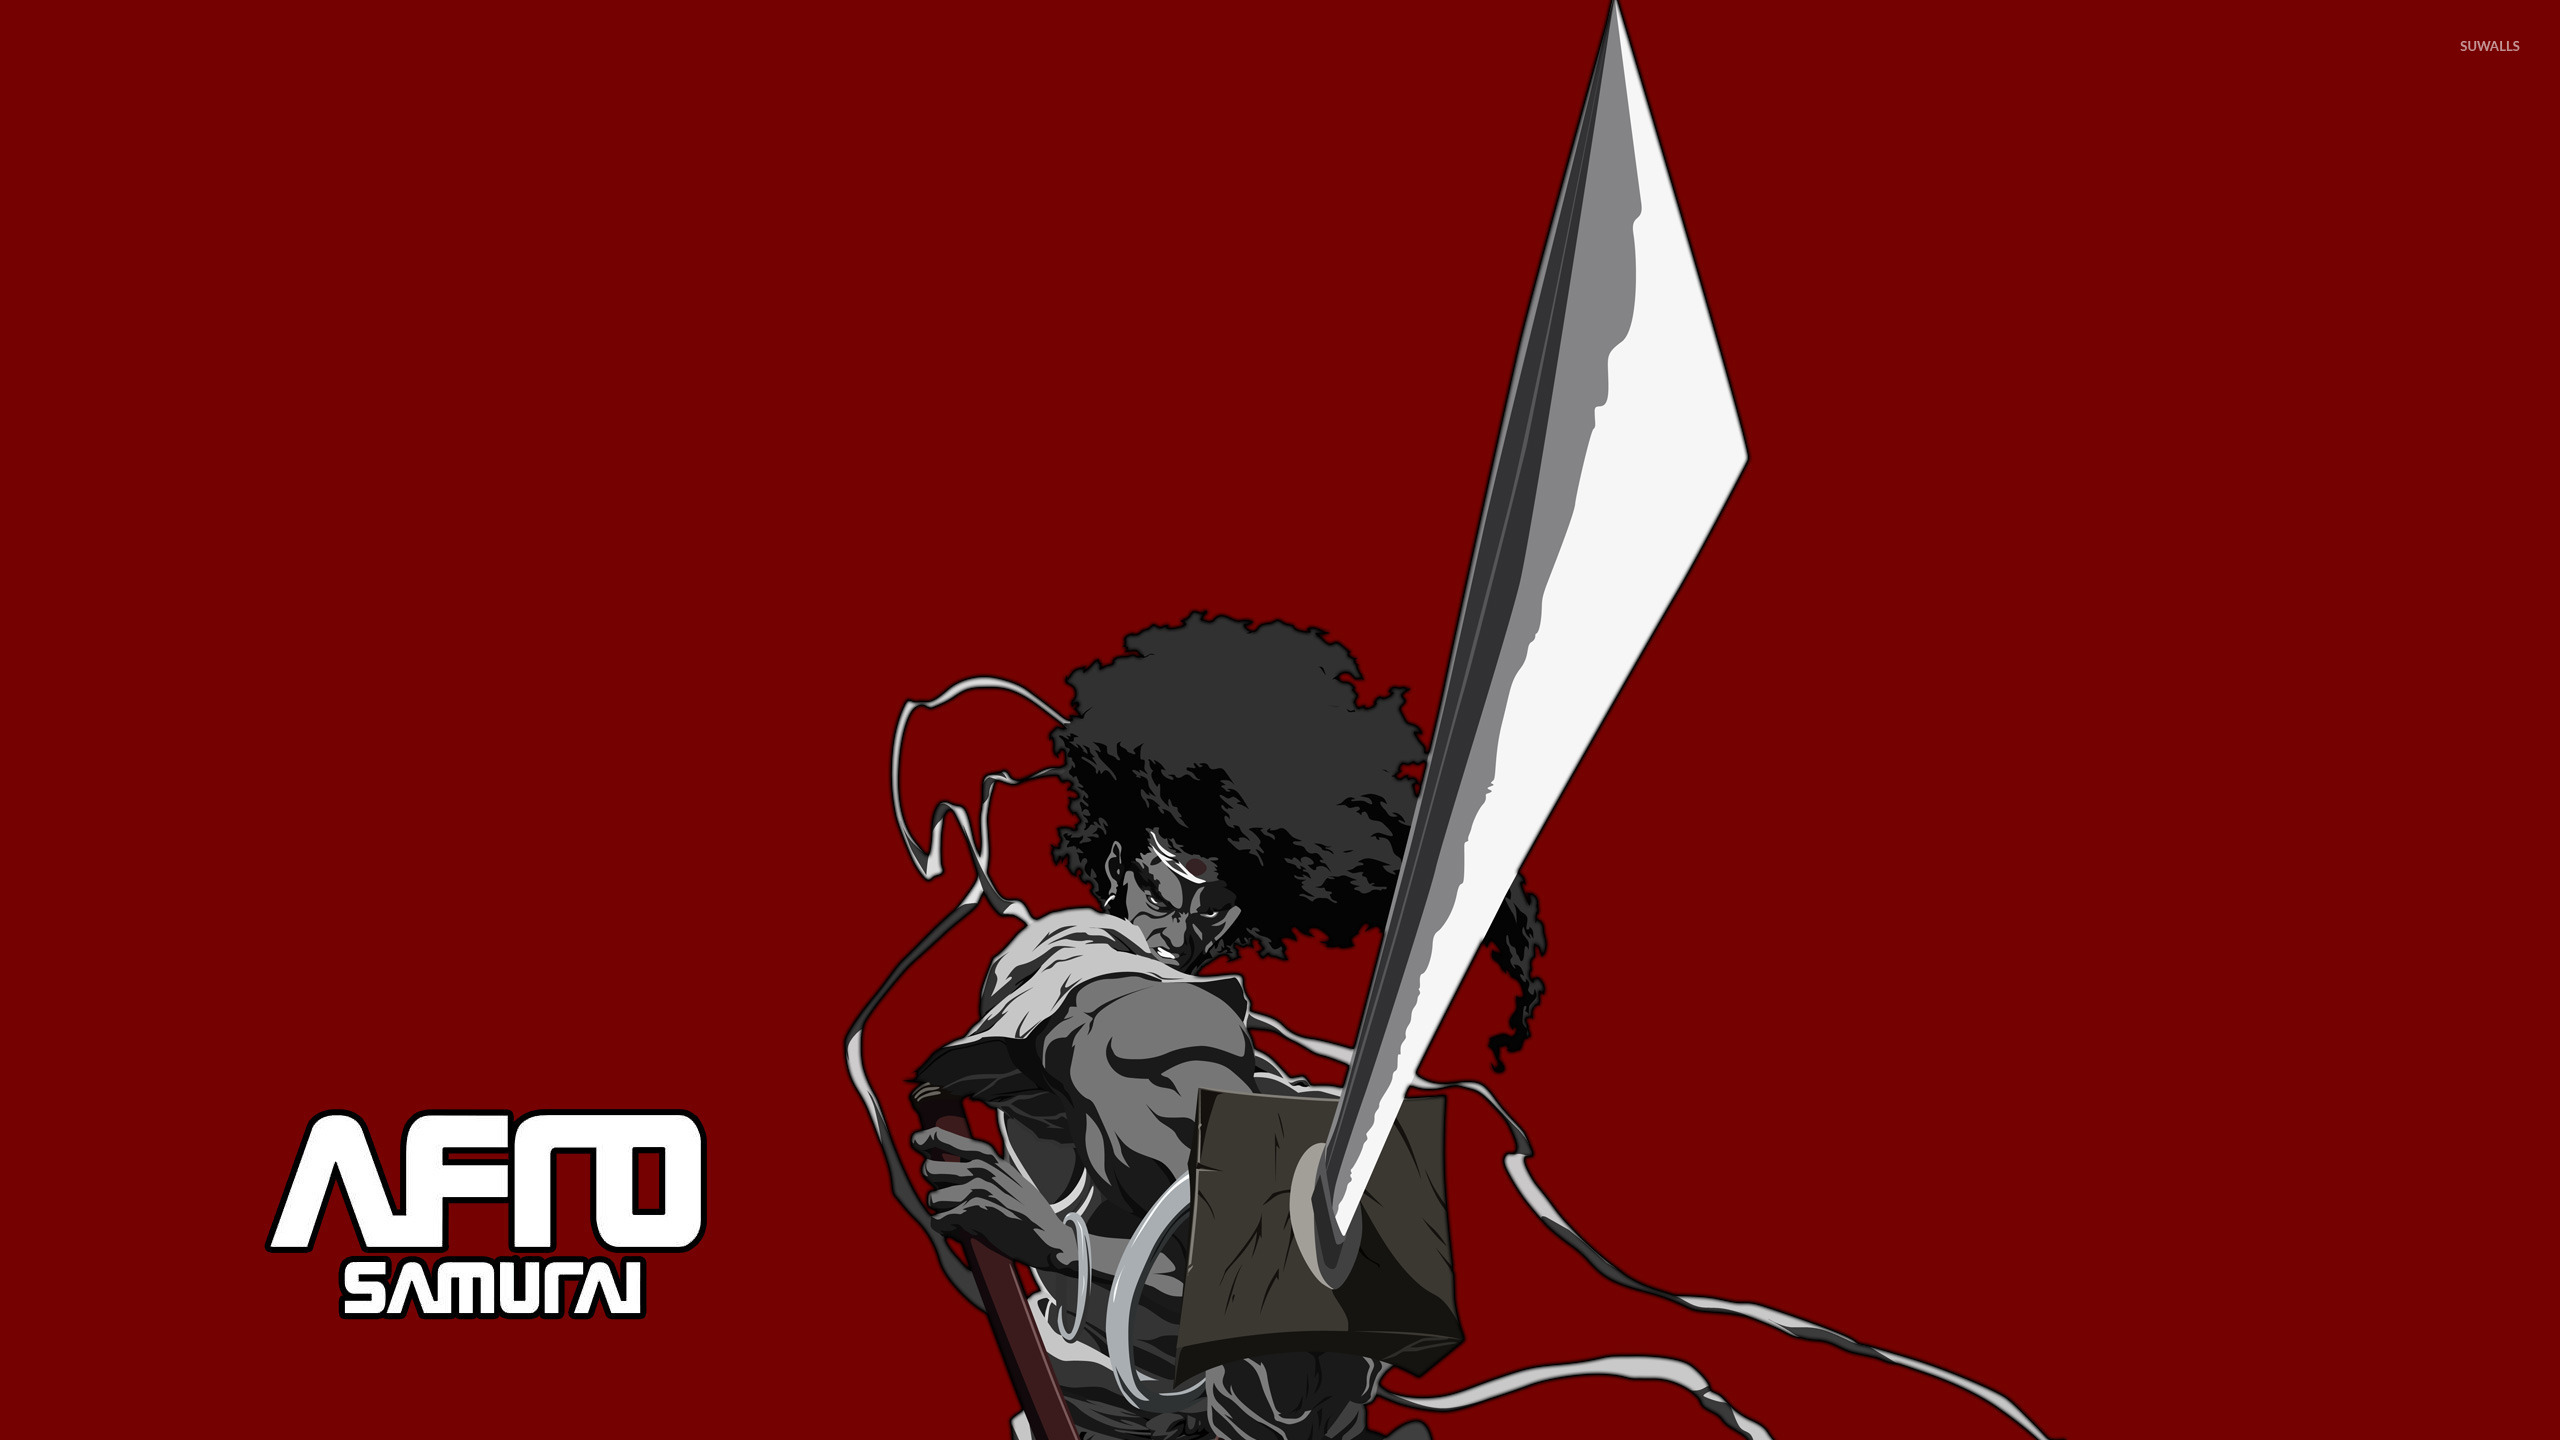 afro samurai 6 wallpaper anime wallpapers 11502